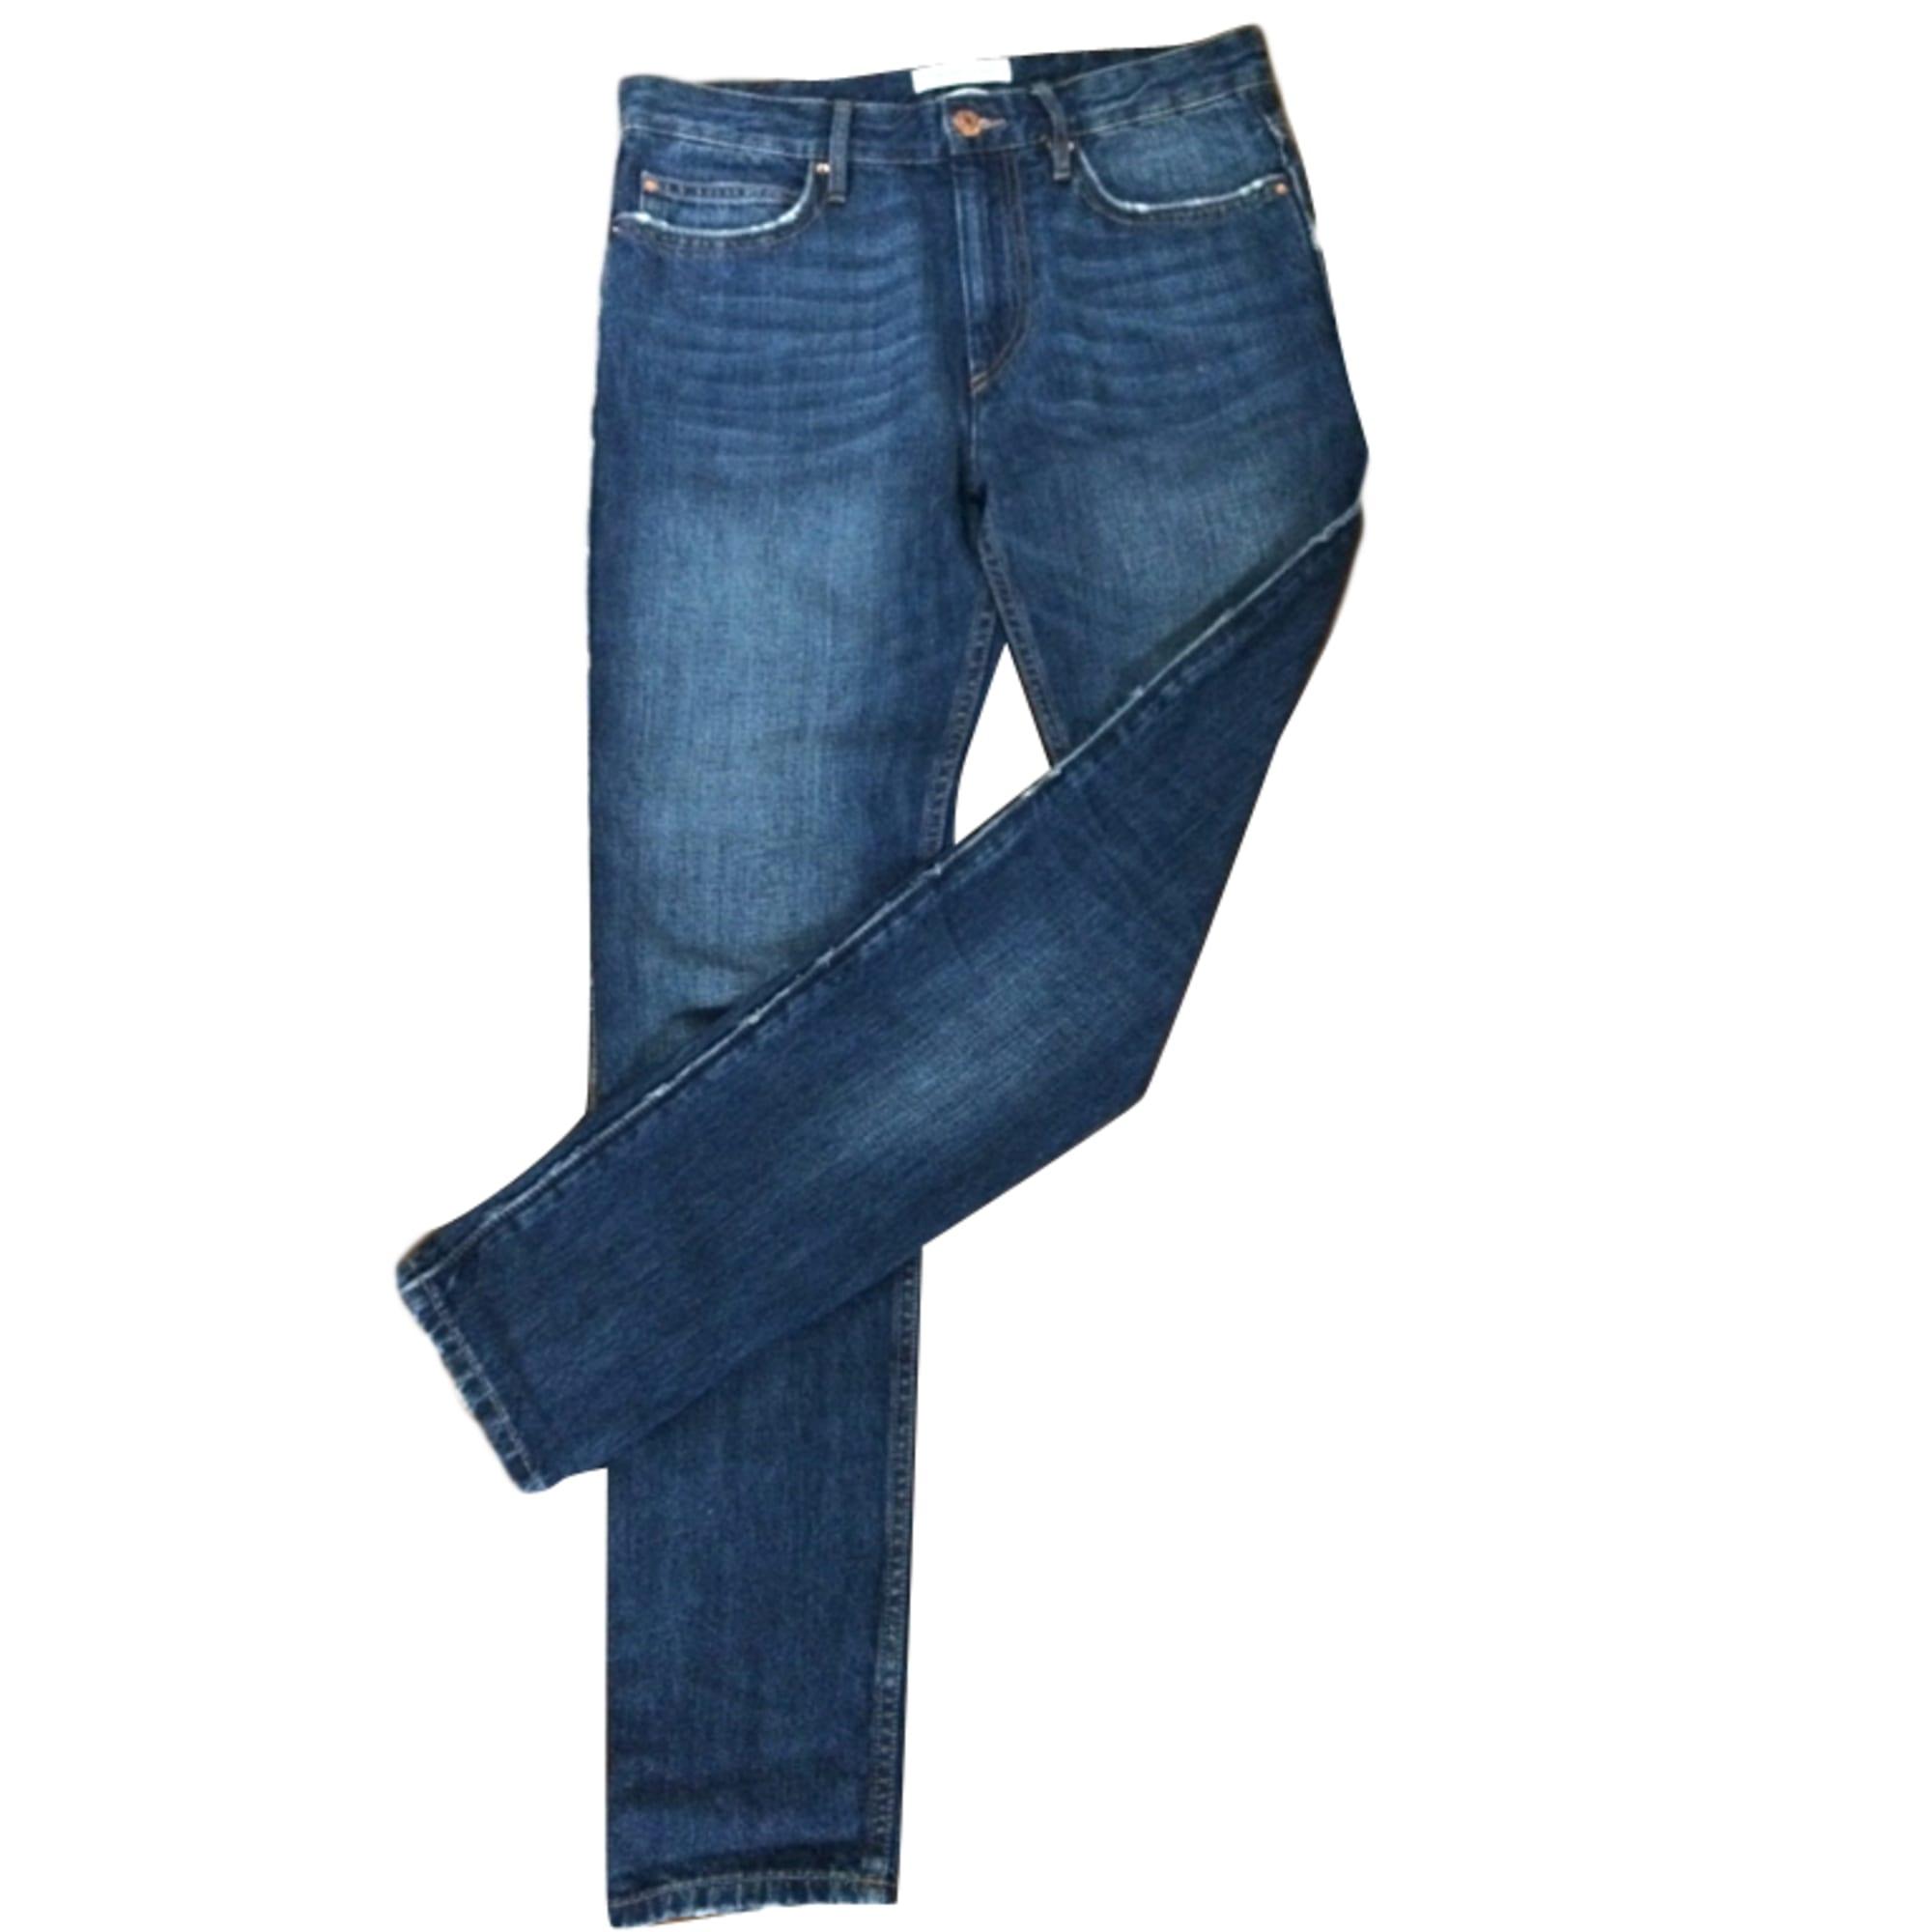 Jeans large, boyfriend ISABEL MARANT Bleu, bleu marine, bleu turquoise